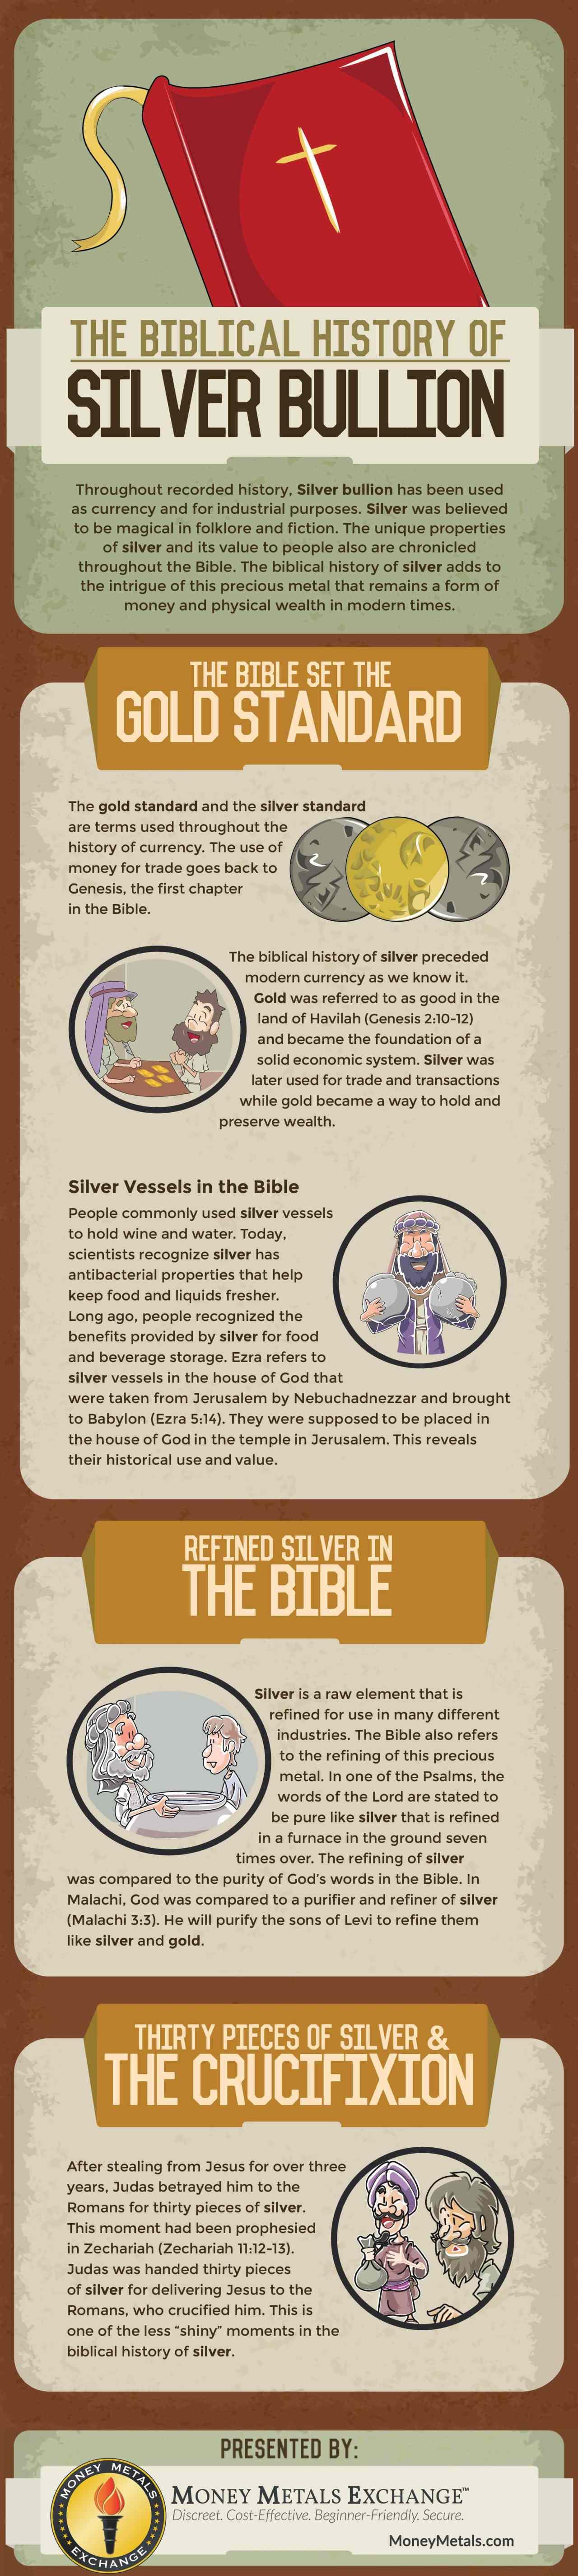 The Biblical History of Silver Bullion